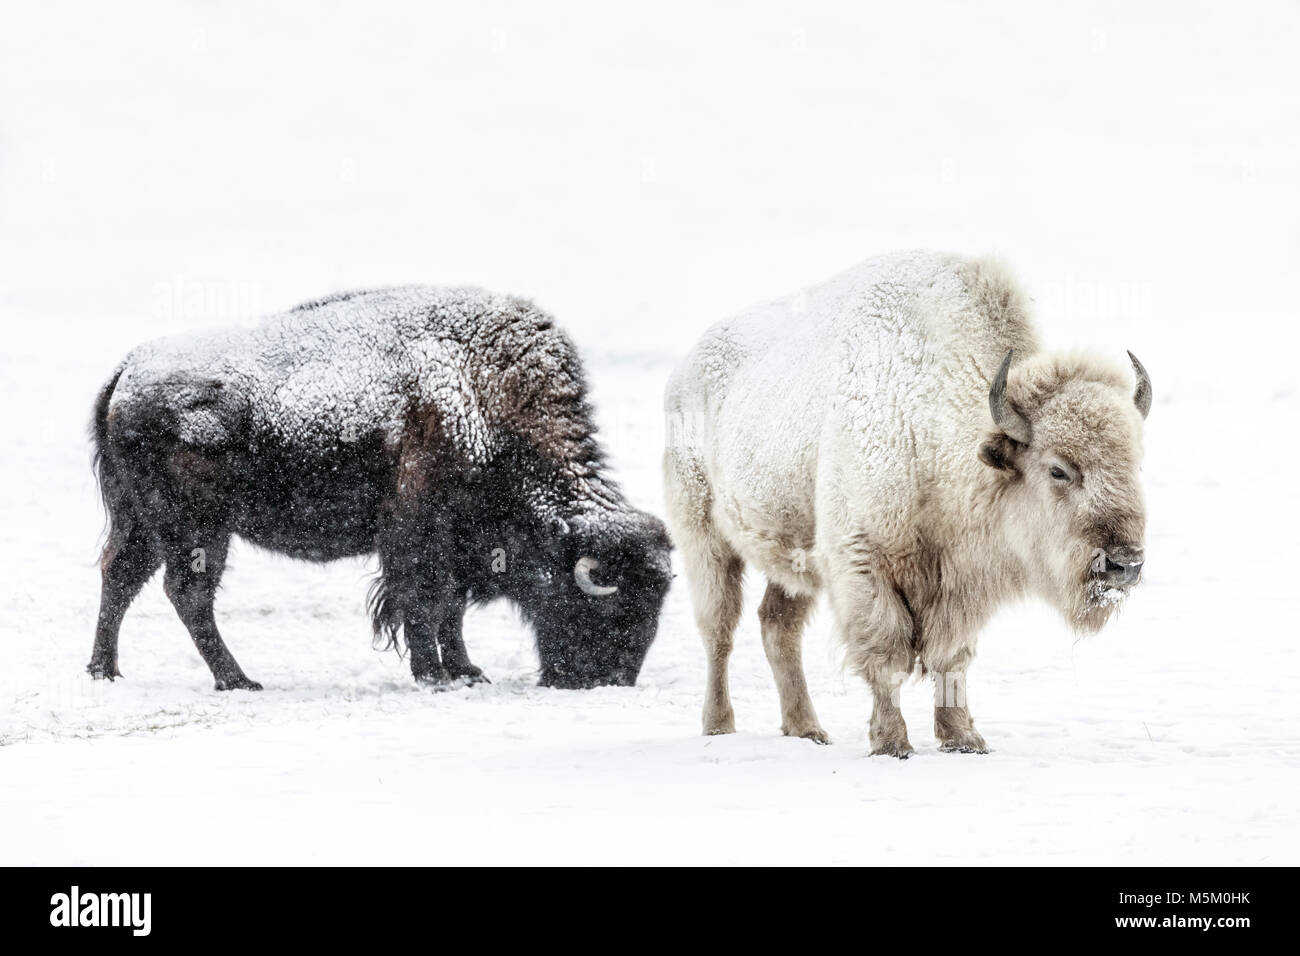 Sacrad White Bison, or Buffalo, Manitoba, Canada. - Stock Image